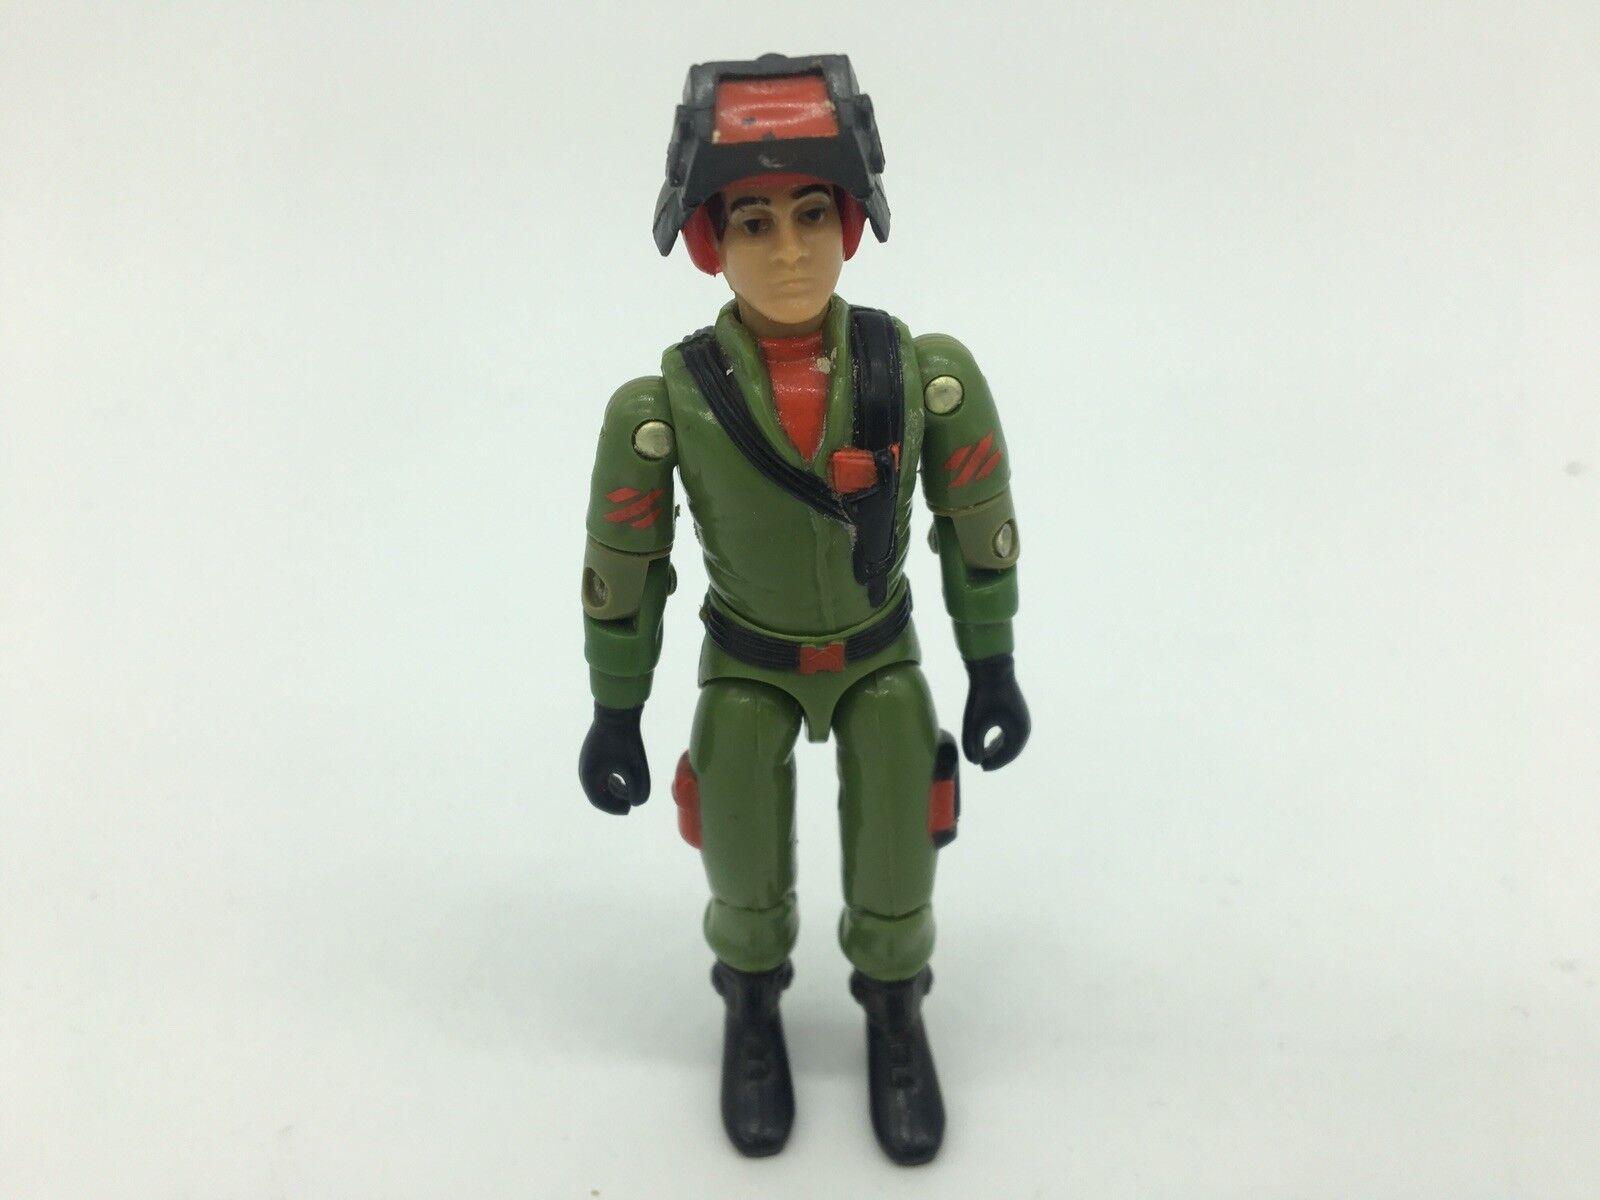 GI Joe, forza di azione, RARE, Steeler, Figura, 1980S, pilota, Battle Tank